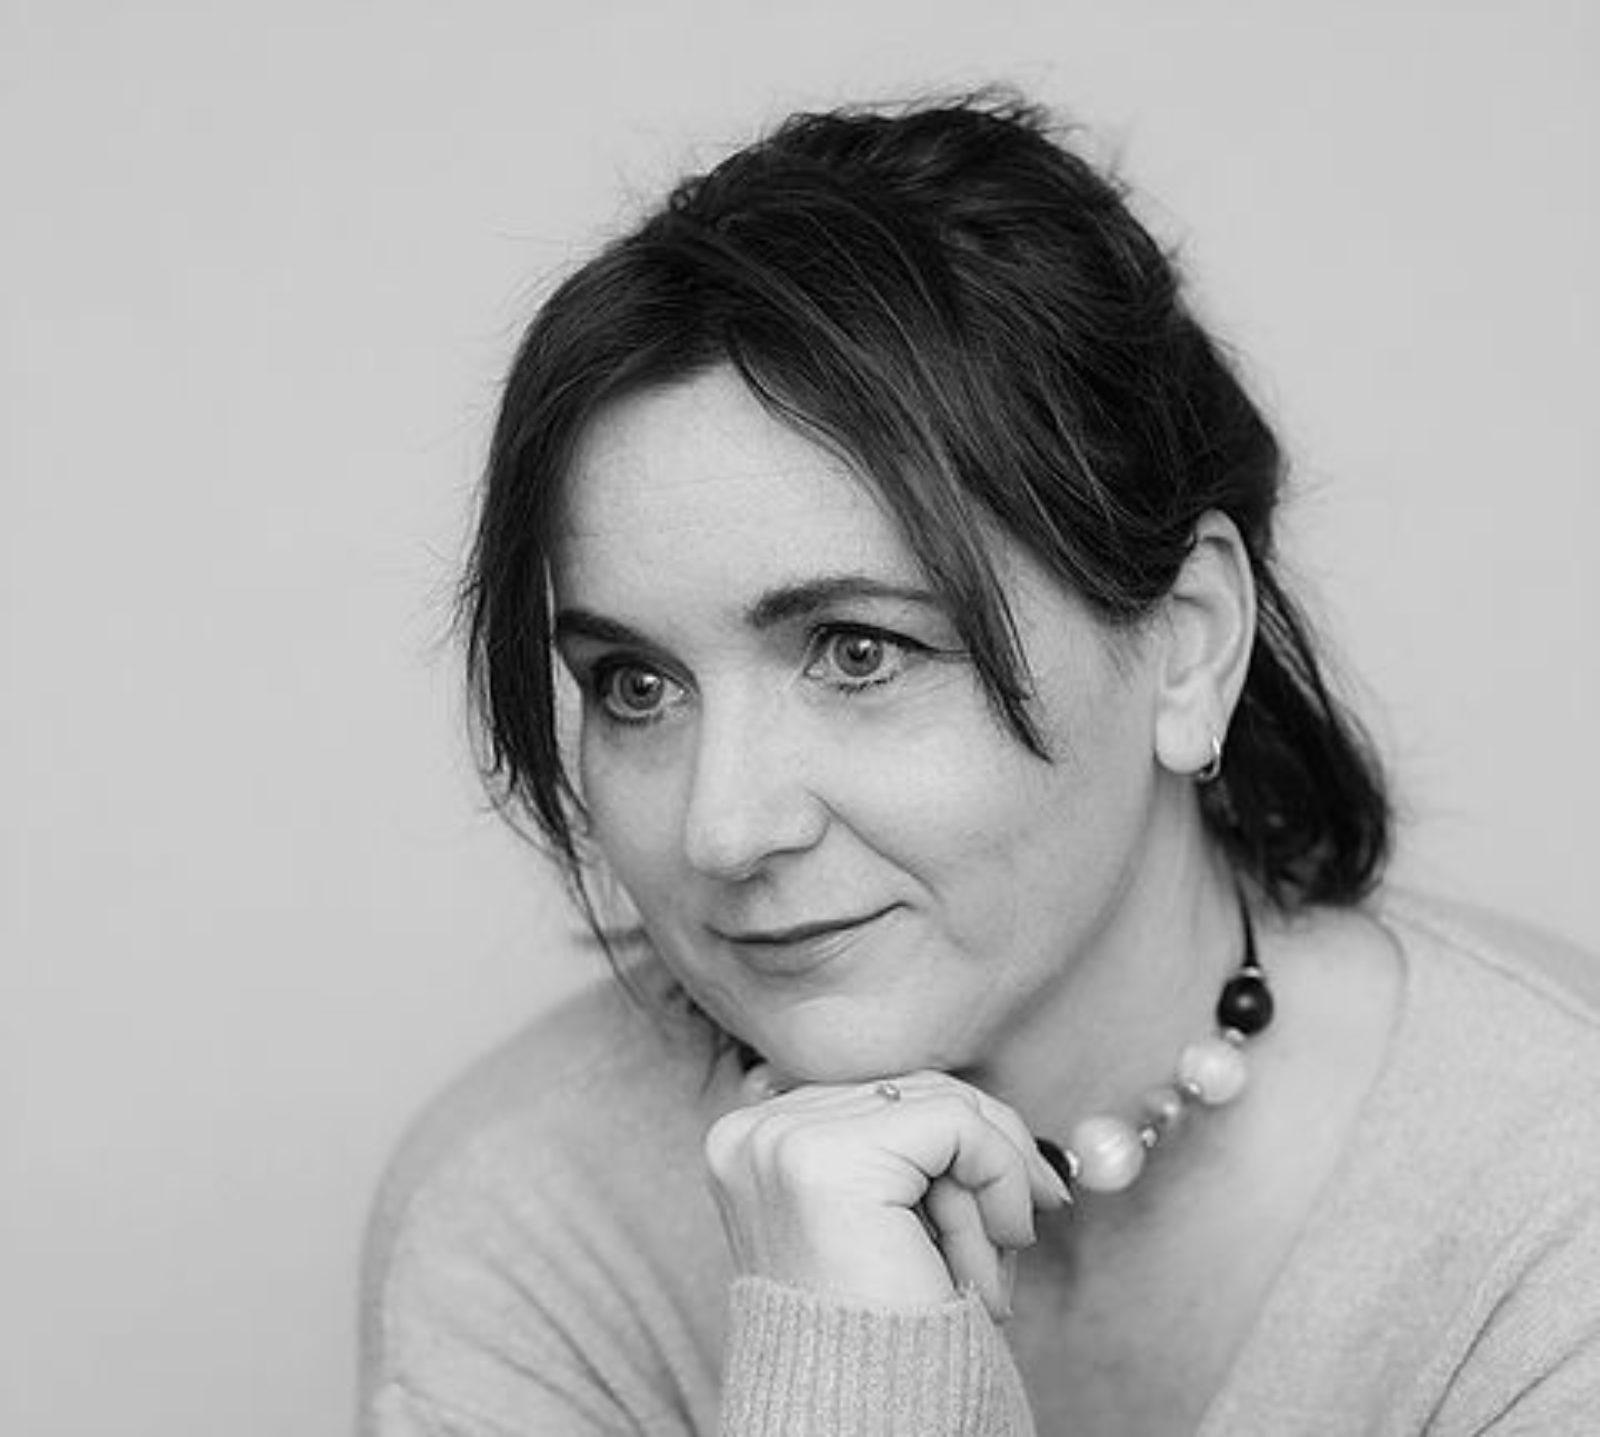 Rachael Meyer